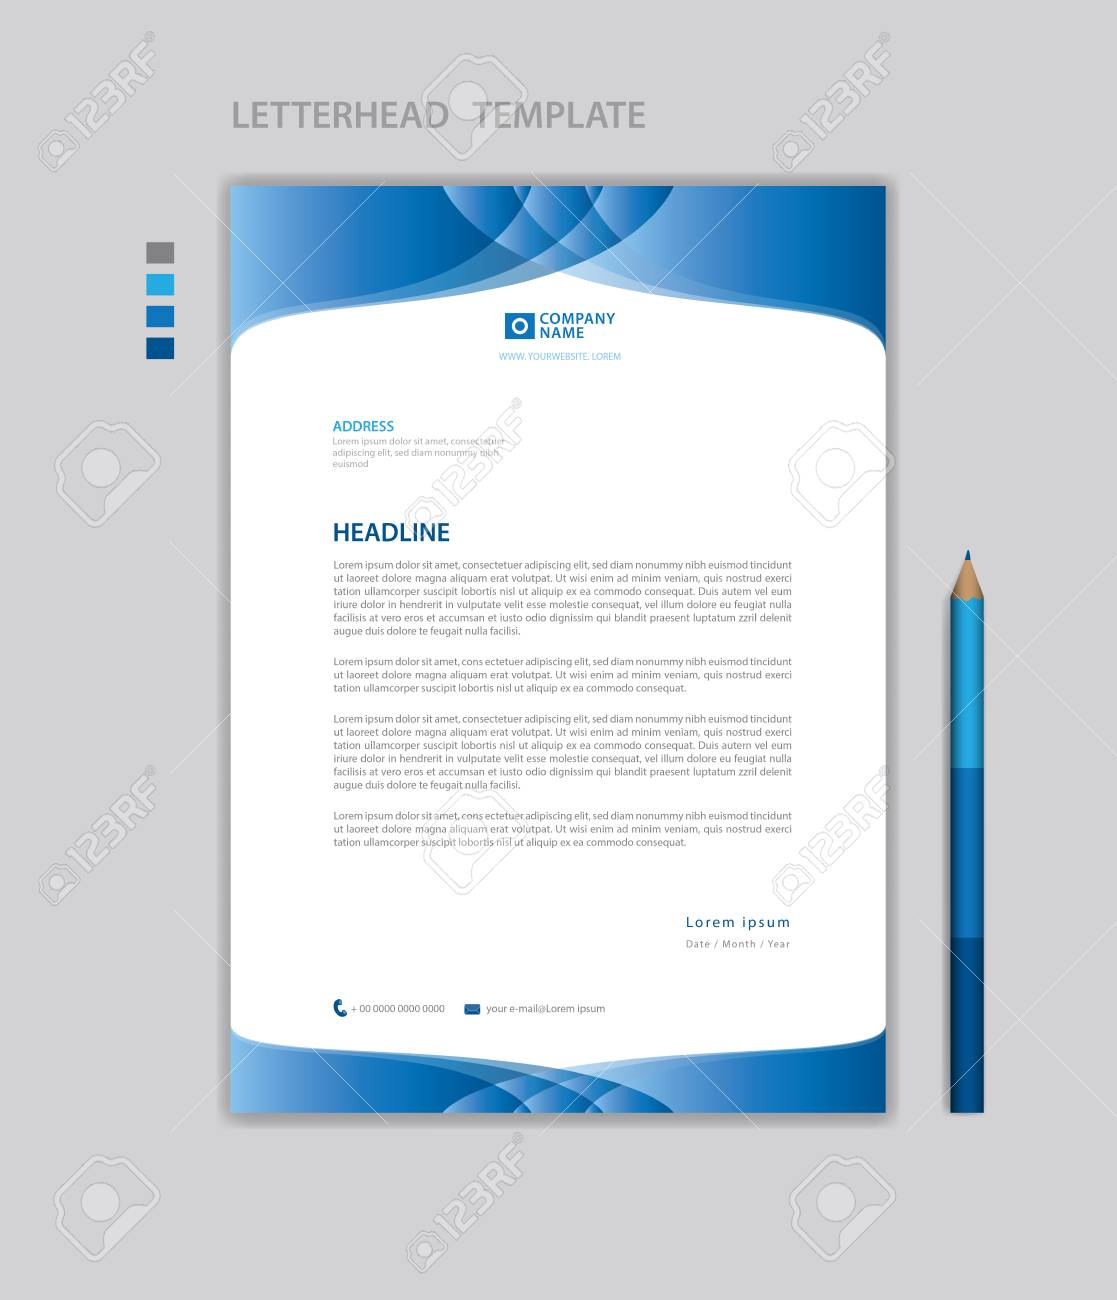 letterhead template  Letterhead template vector, minimalist style, printing design,..